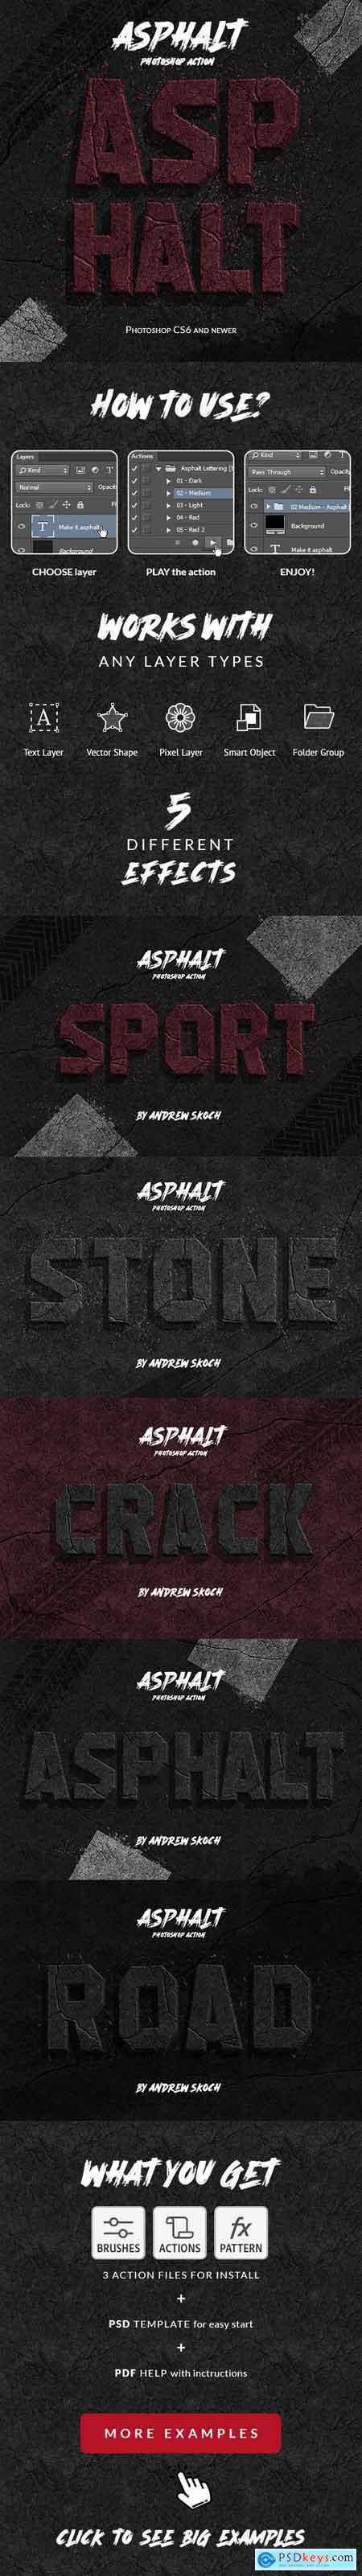 Asphalt - Photoshop Action 26088344